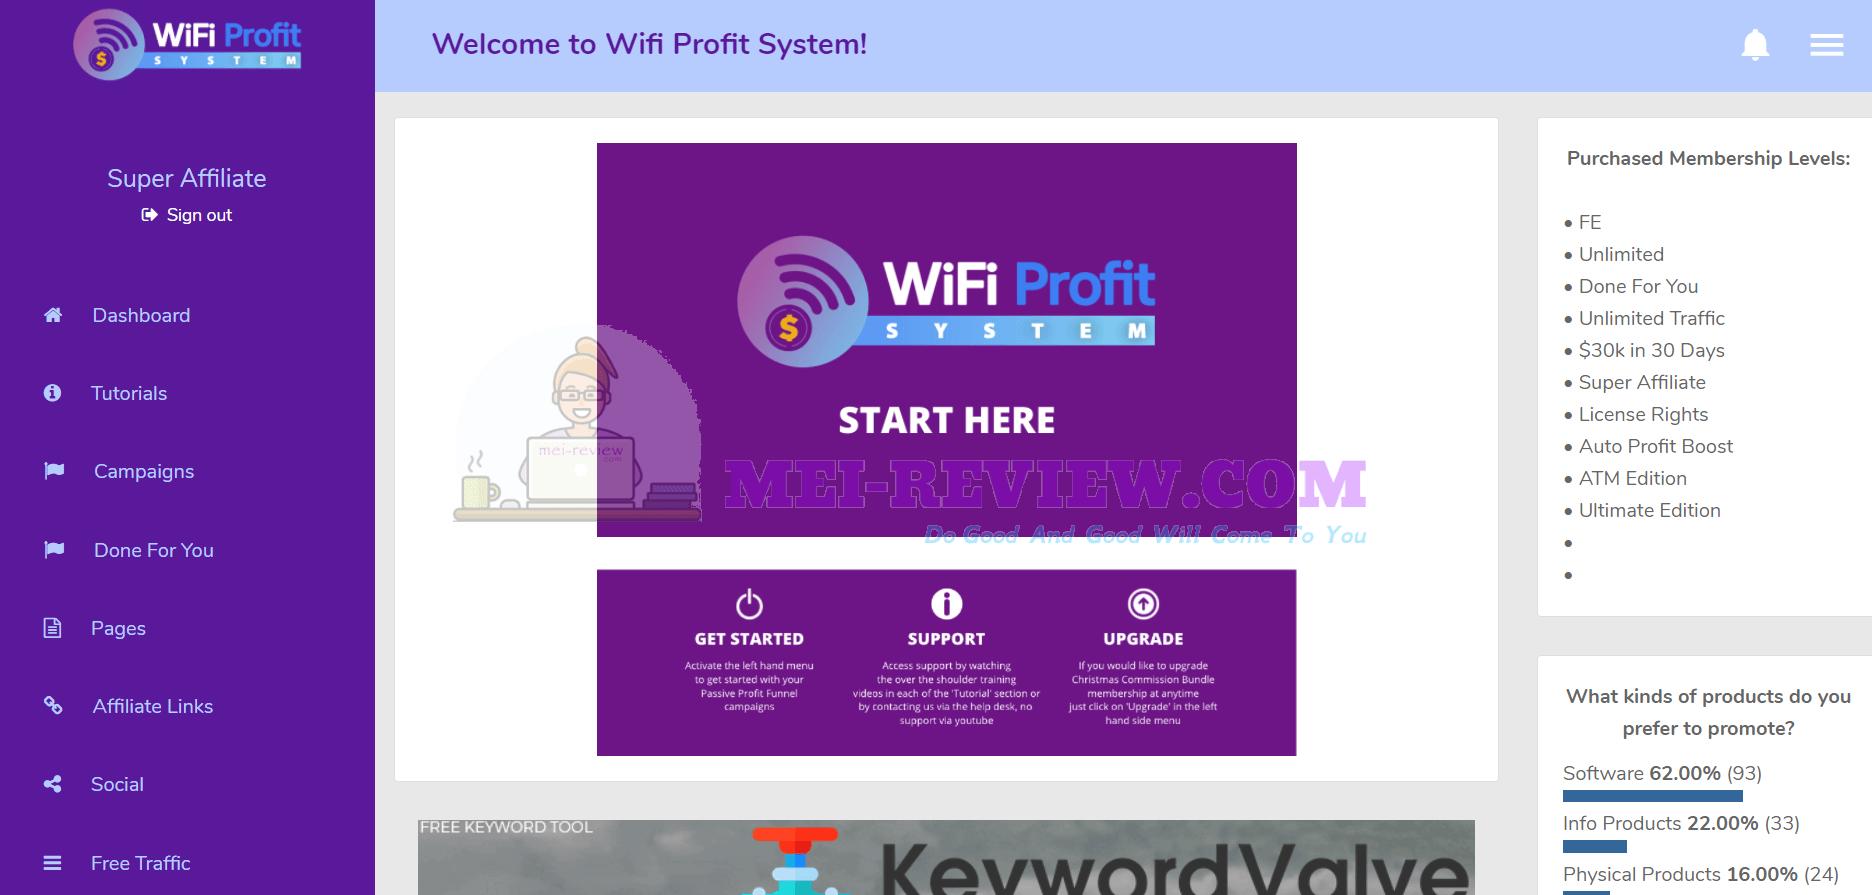 Wifi-Profit-System-App